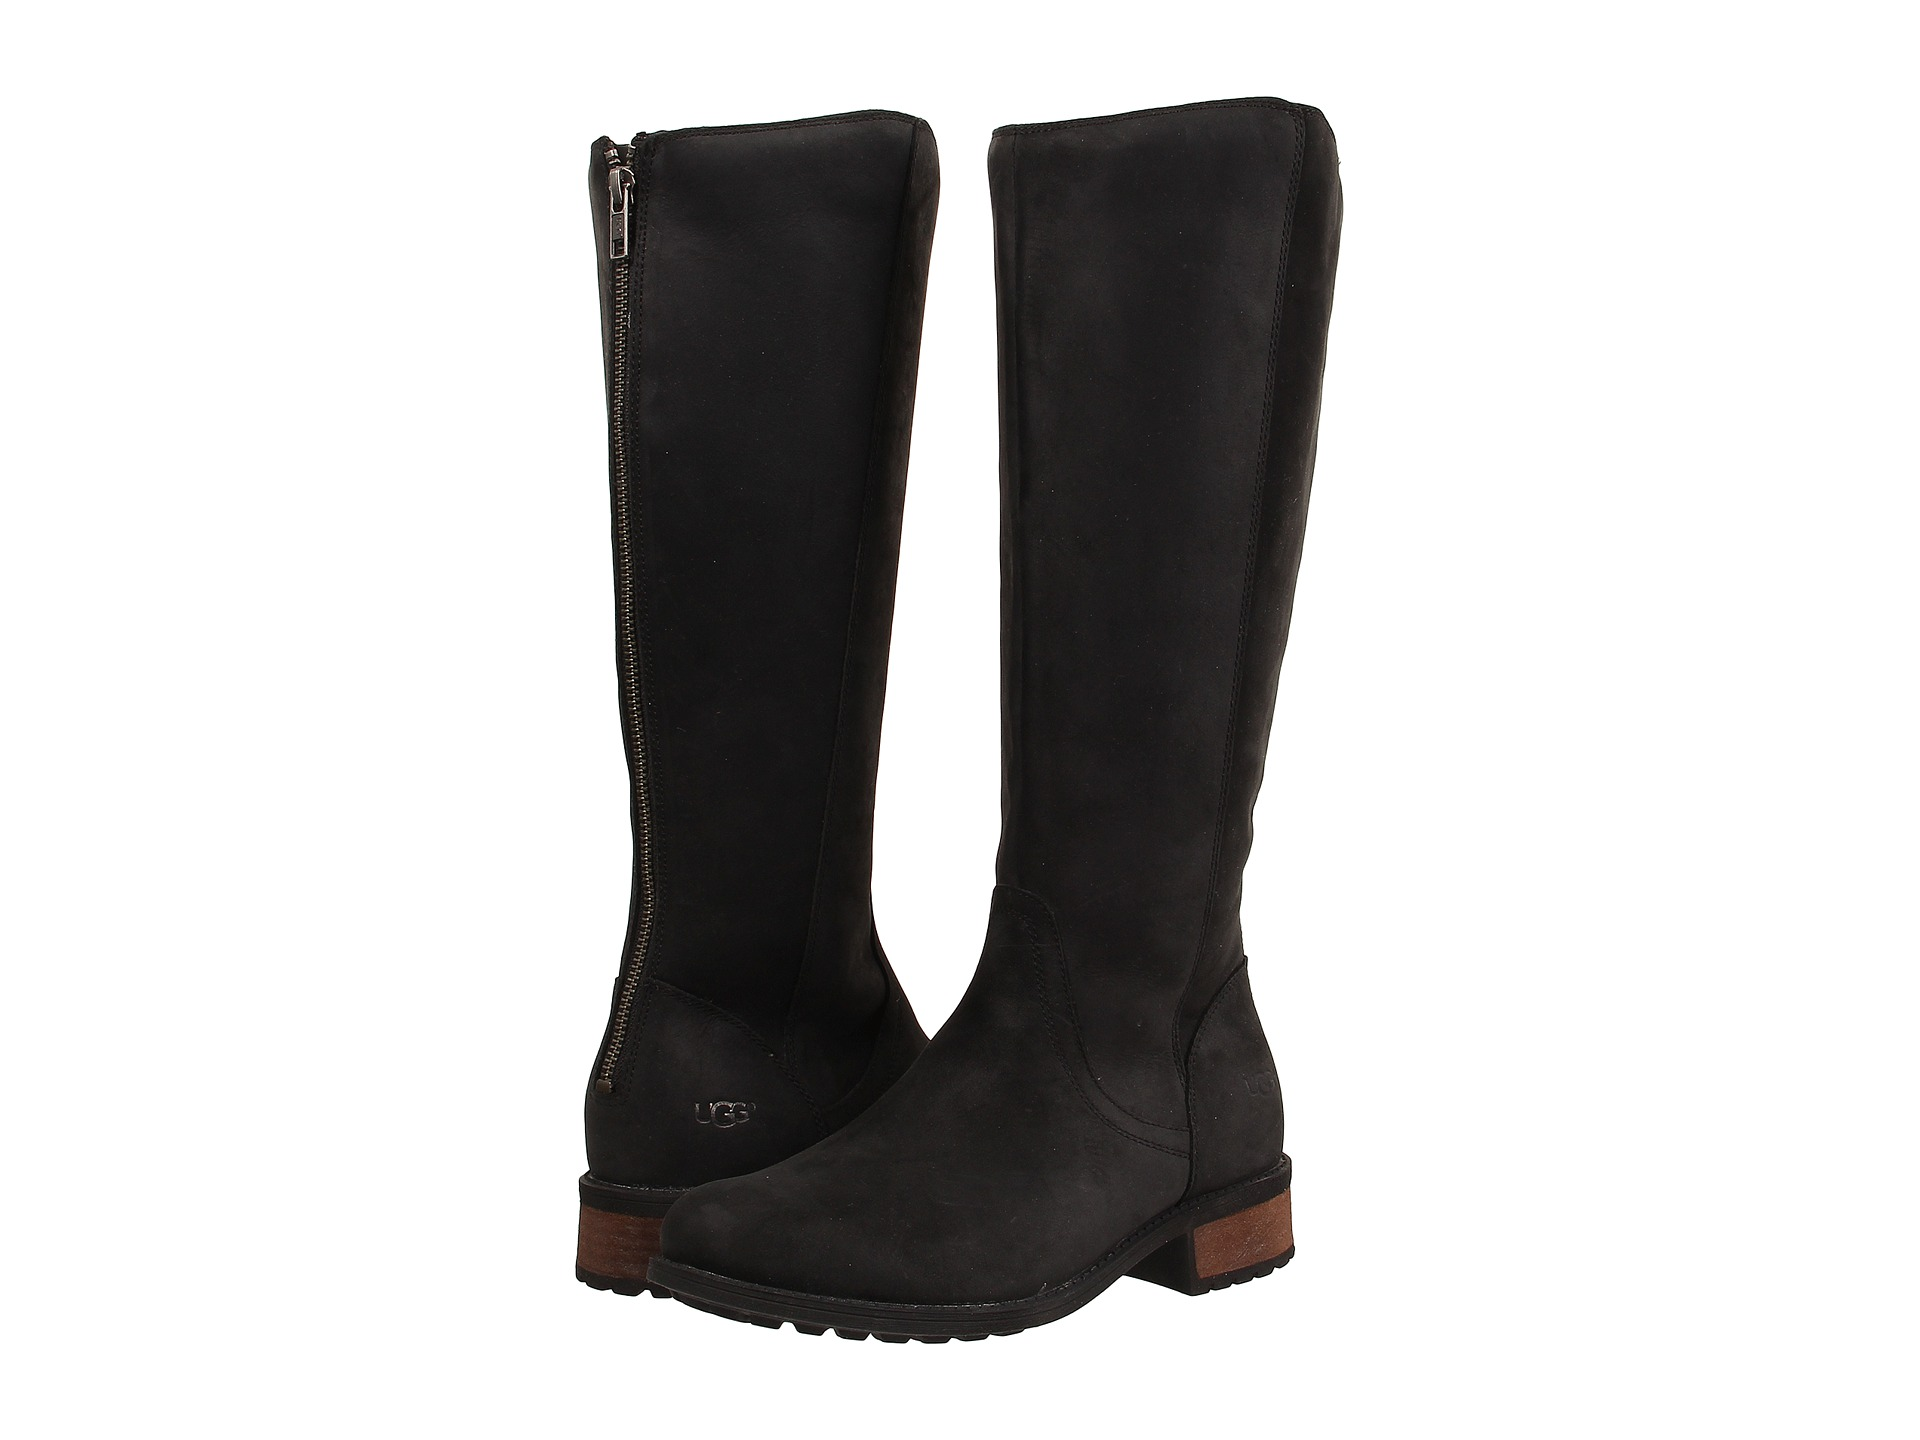 ugg australia boots dsw 4322